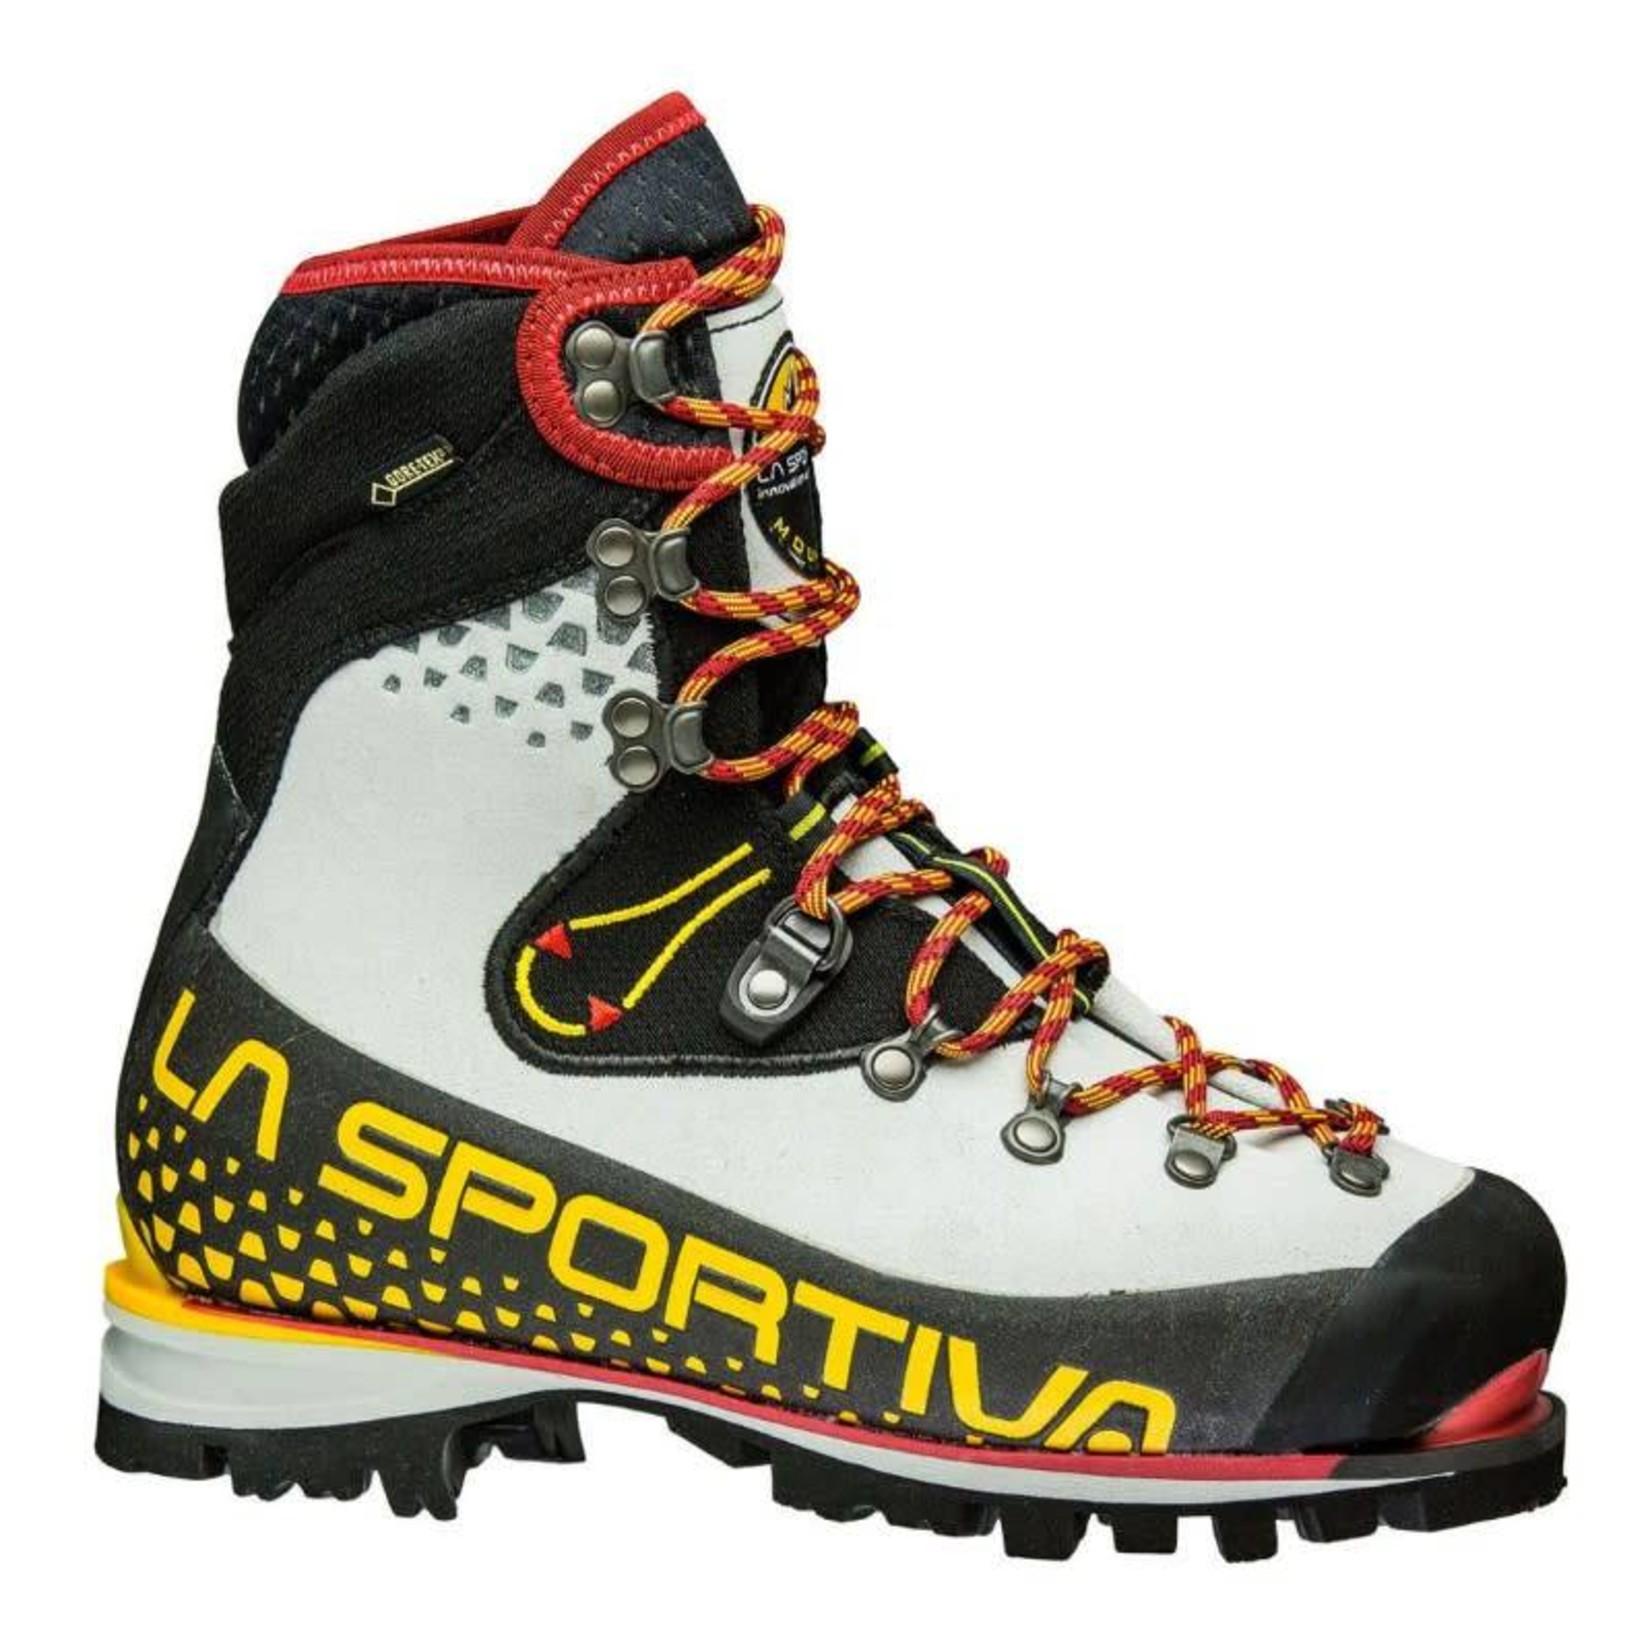 La Sportiva Botte La Sportiva Nepal Cube GTX  - Femme